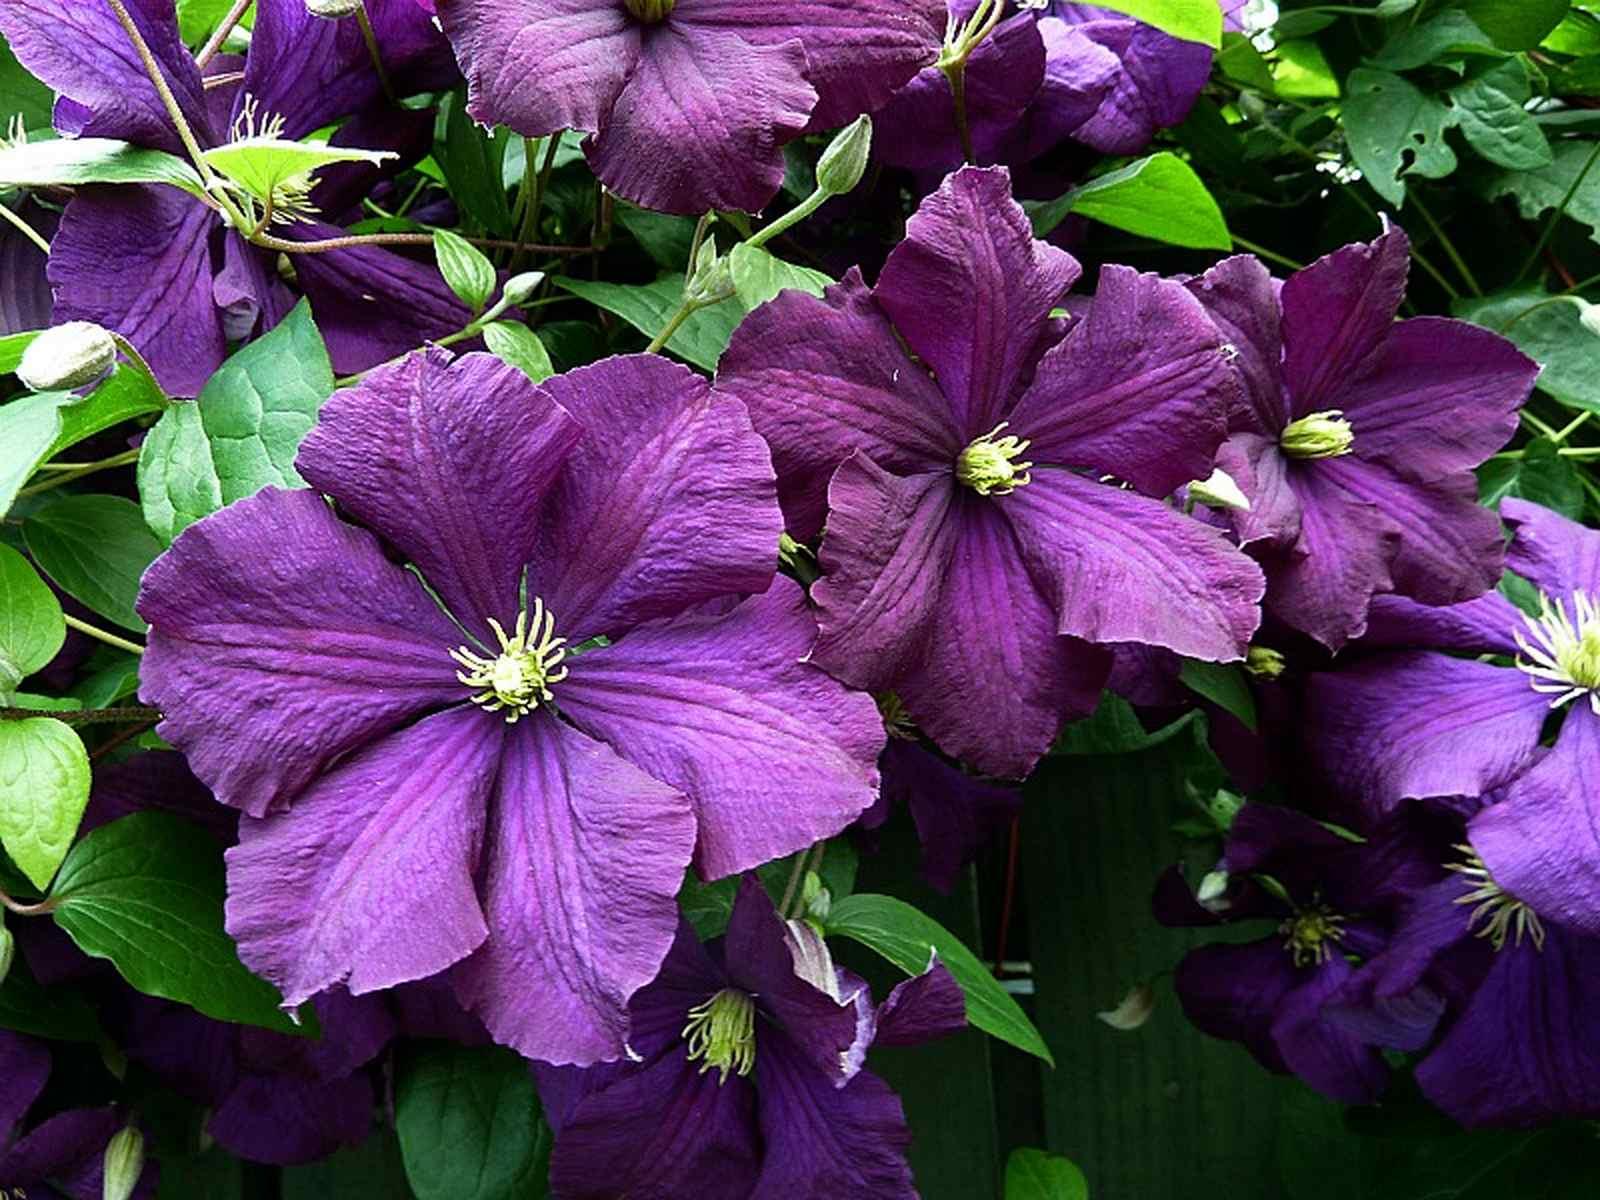 clematis etoile violette types and varieties clematis. Black Bedroom Furniture Sets. Home Design Ideas